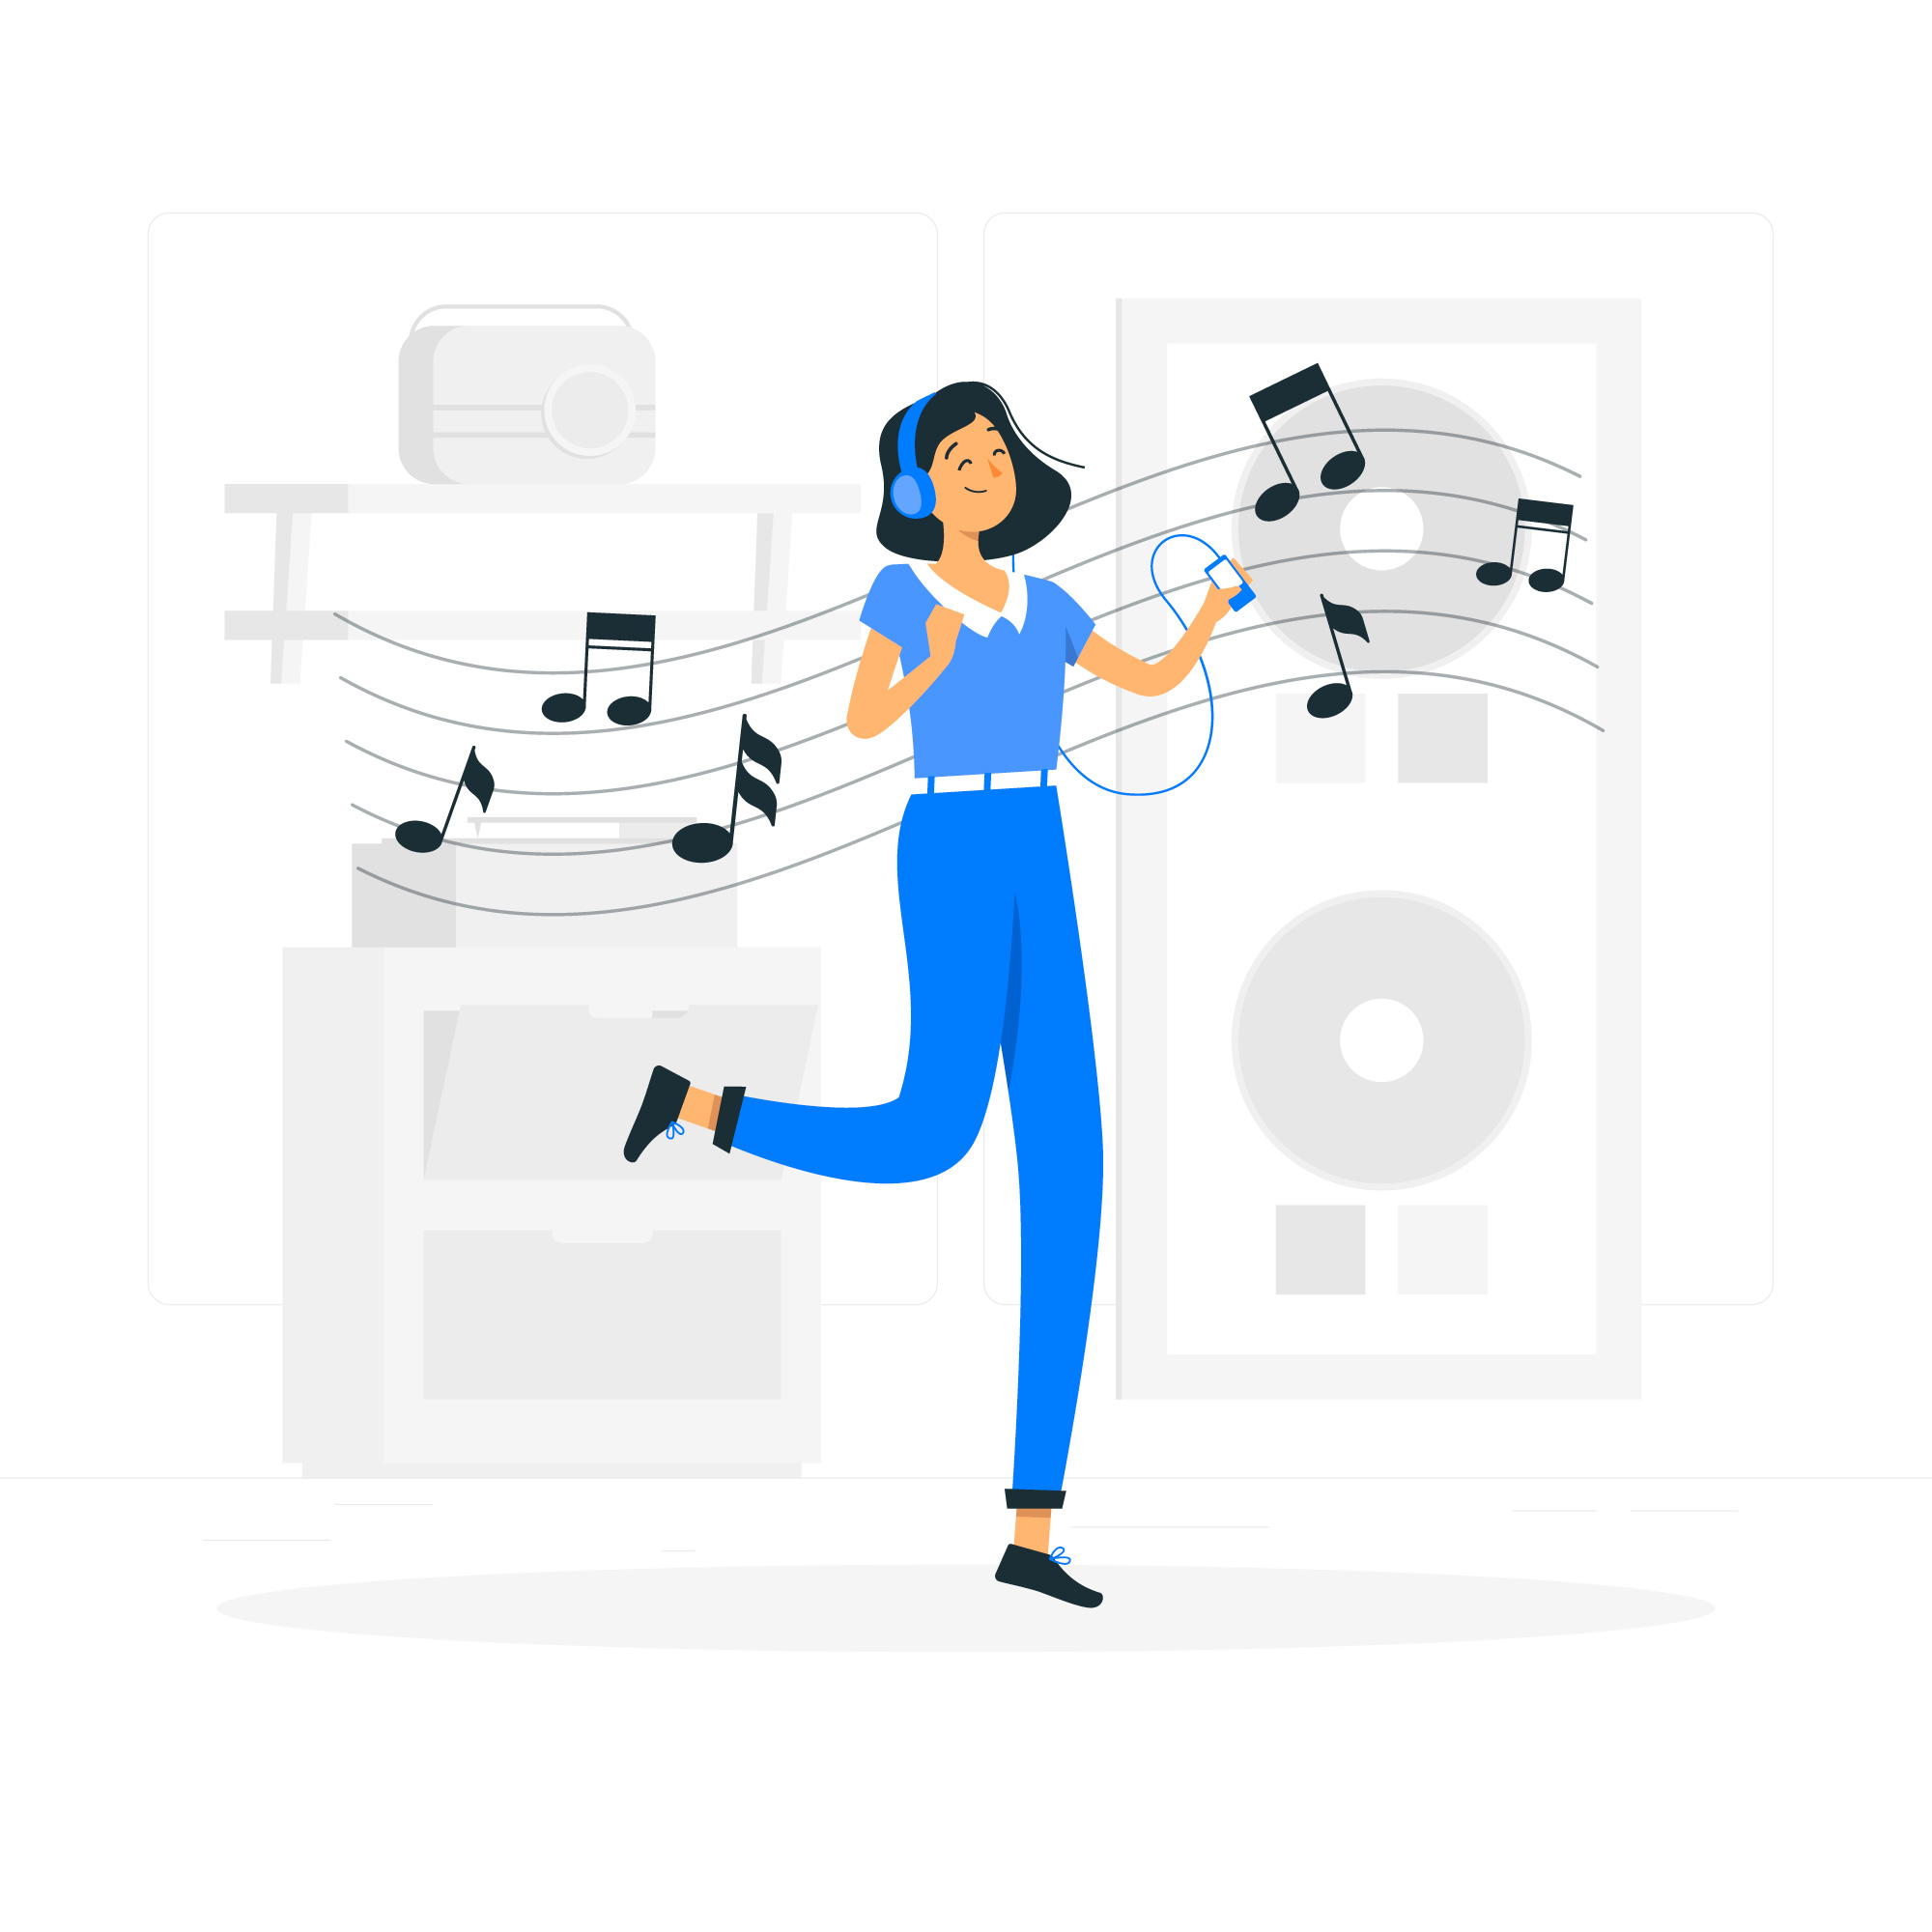 10 Popular TikTok Songs Right Now In 2020